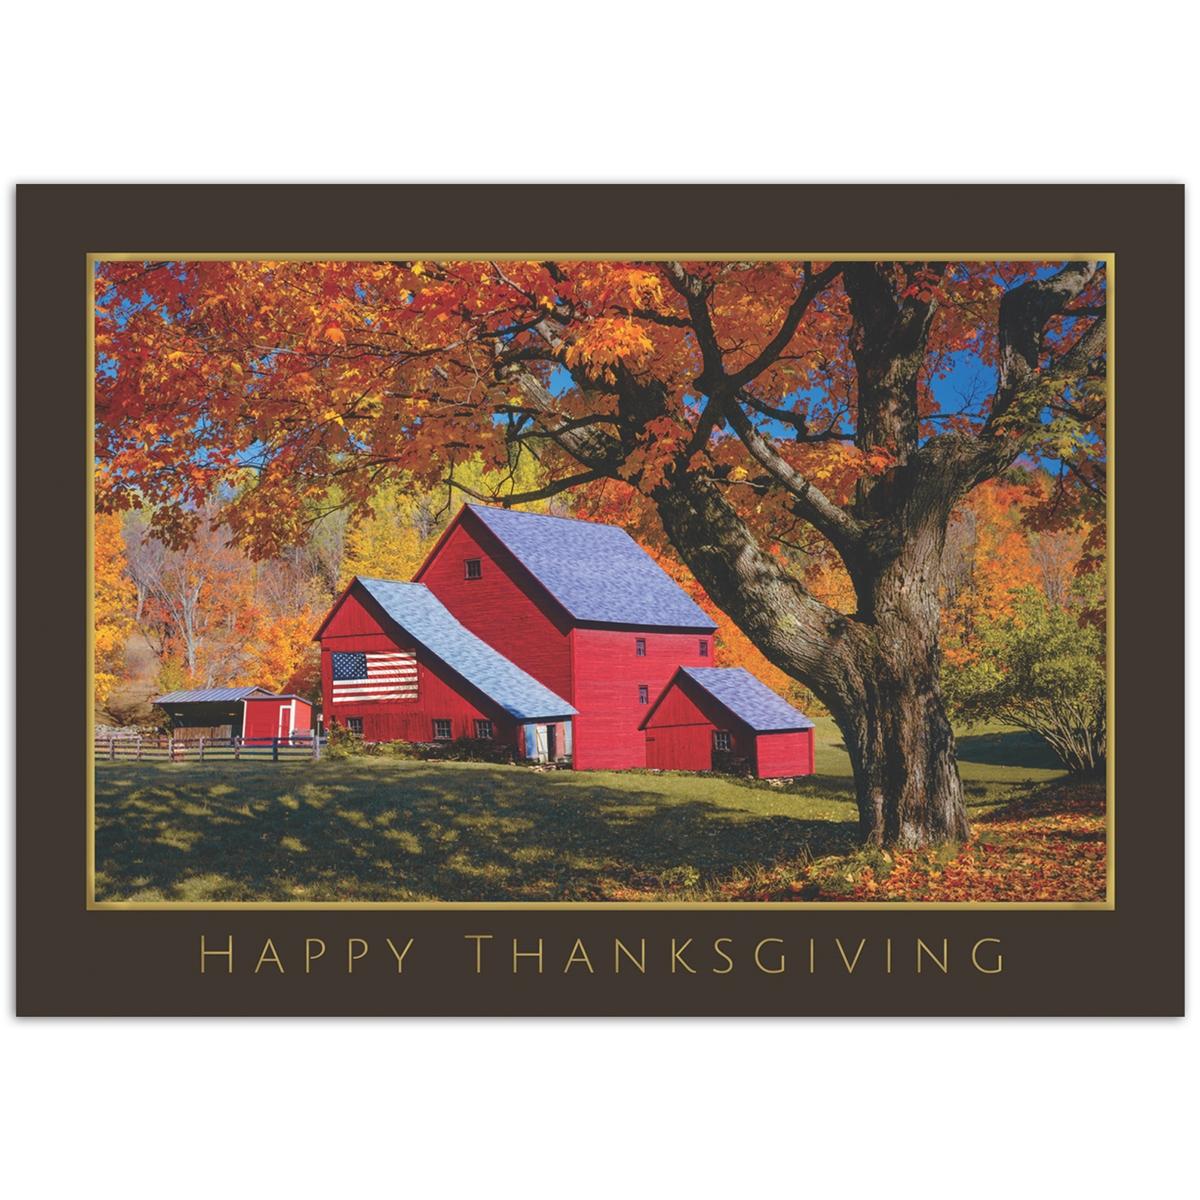 Patriotic Thanksgiving Card